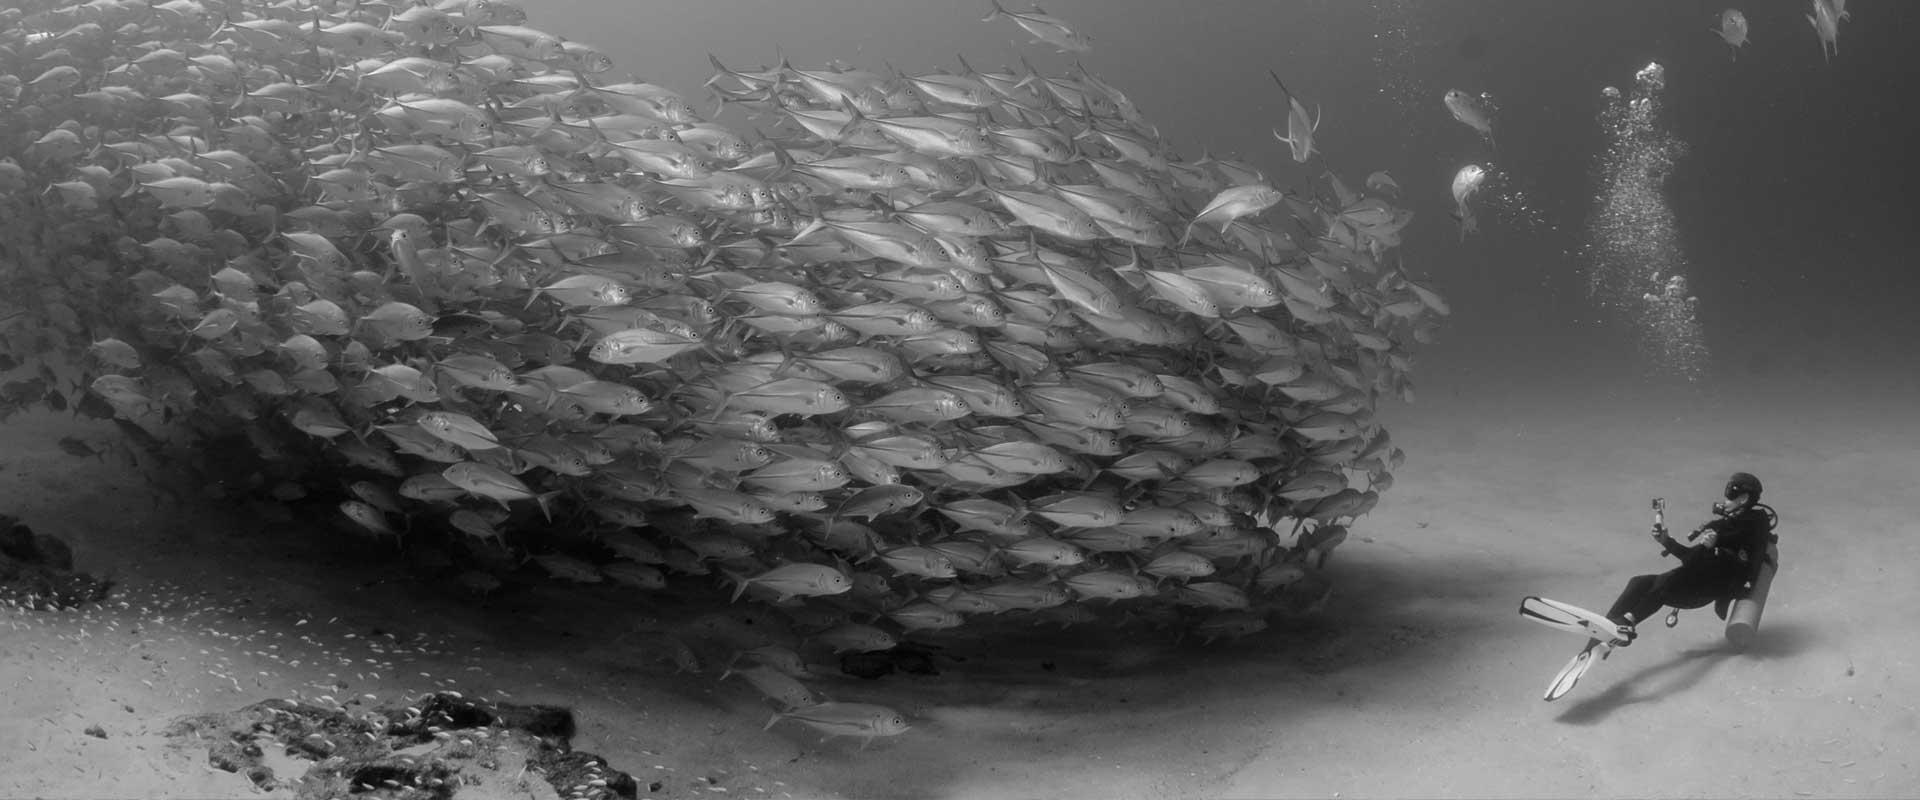 Plongée et poisson